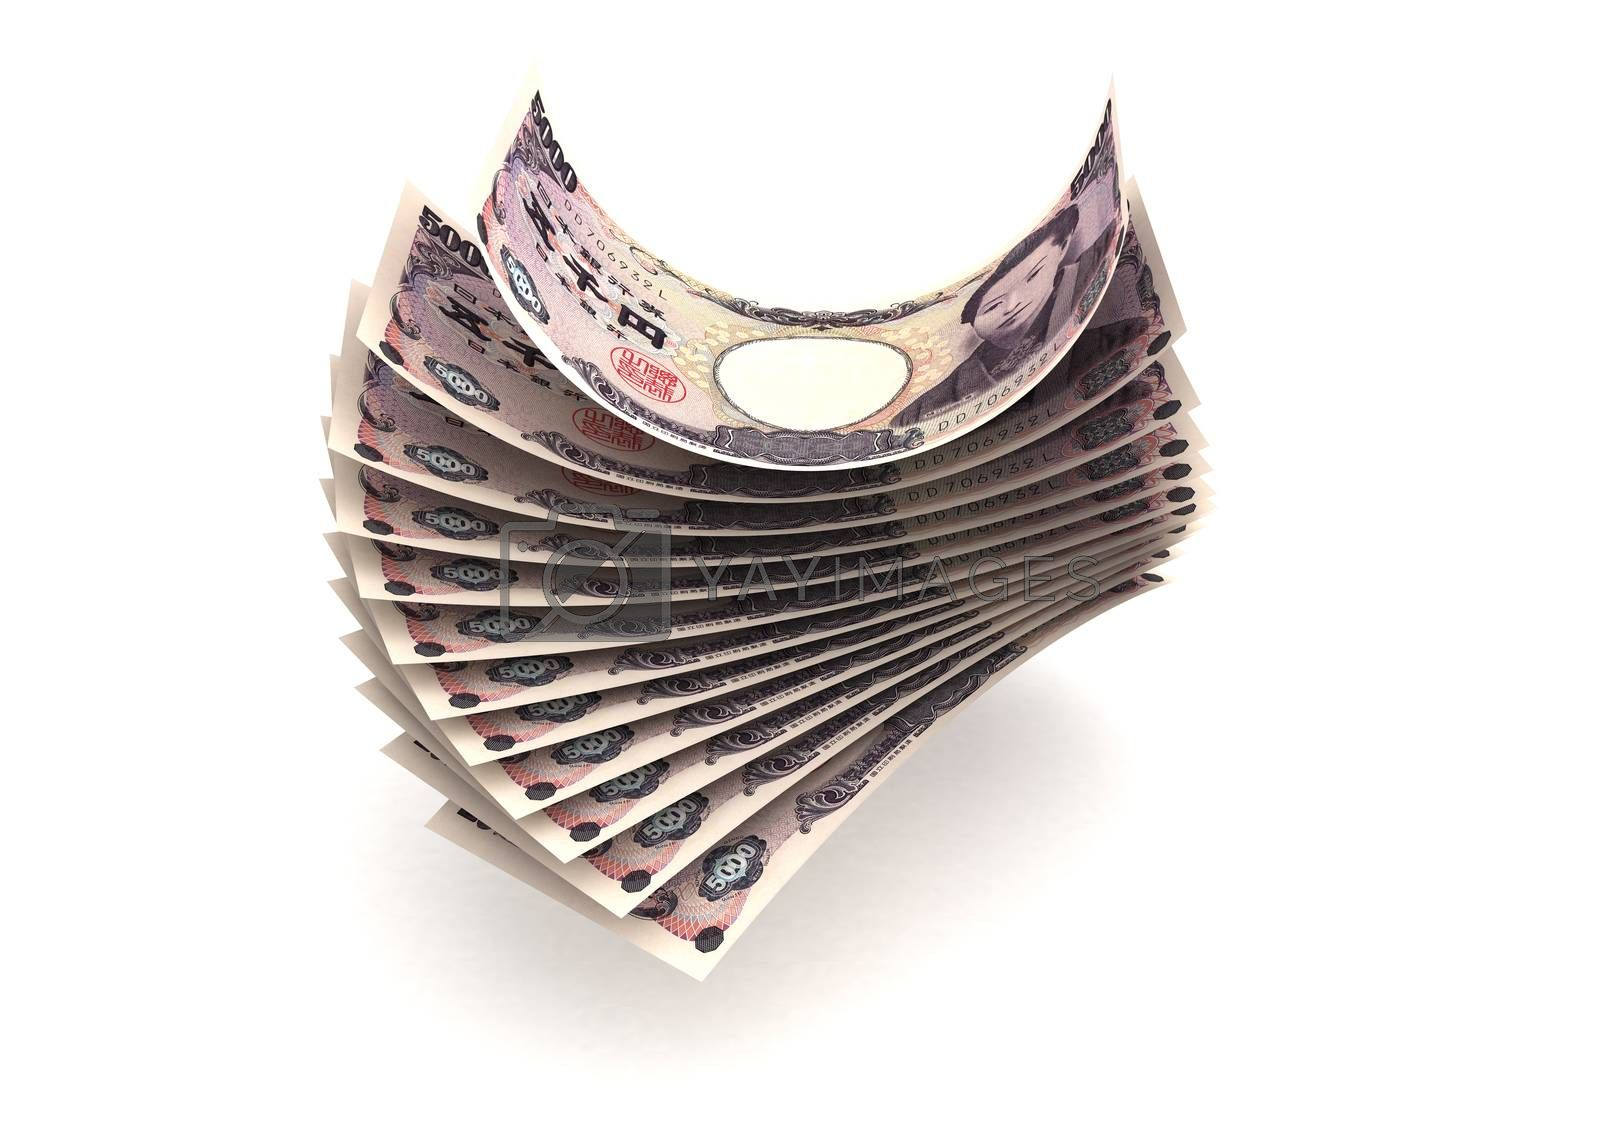 Royalty free image of Japanese Yen by selensergen